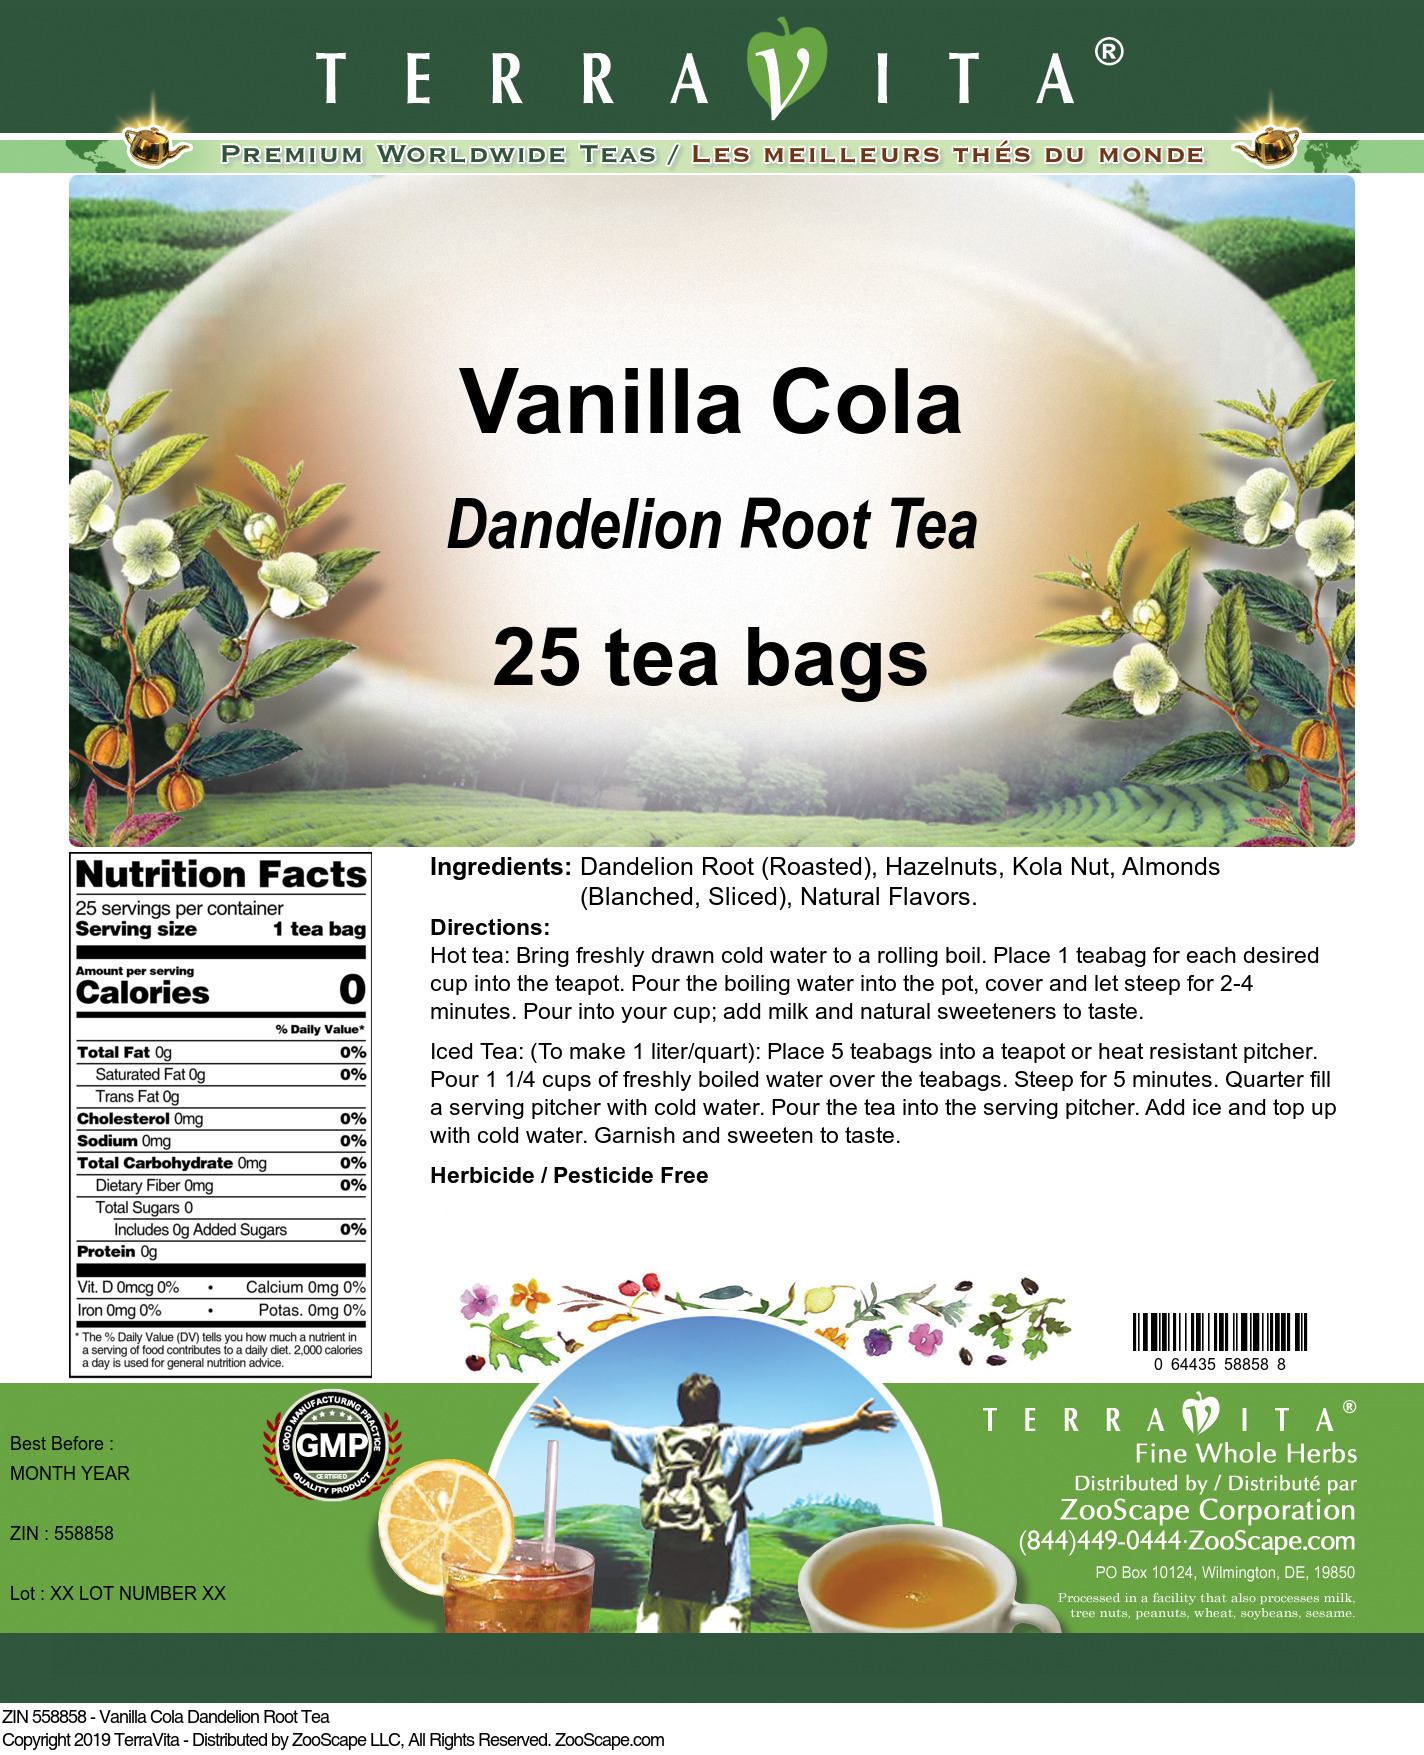 Vanilla Cola Dandelion Root